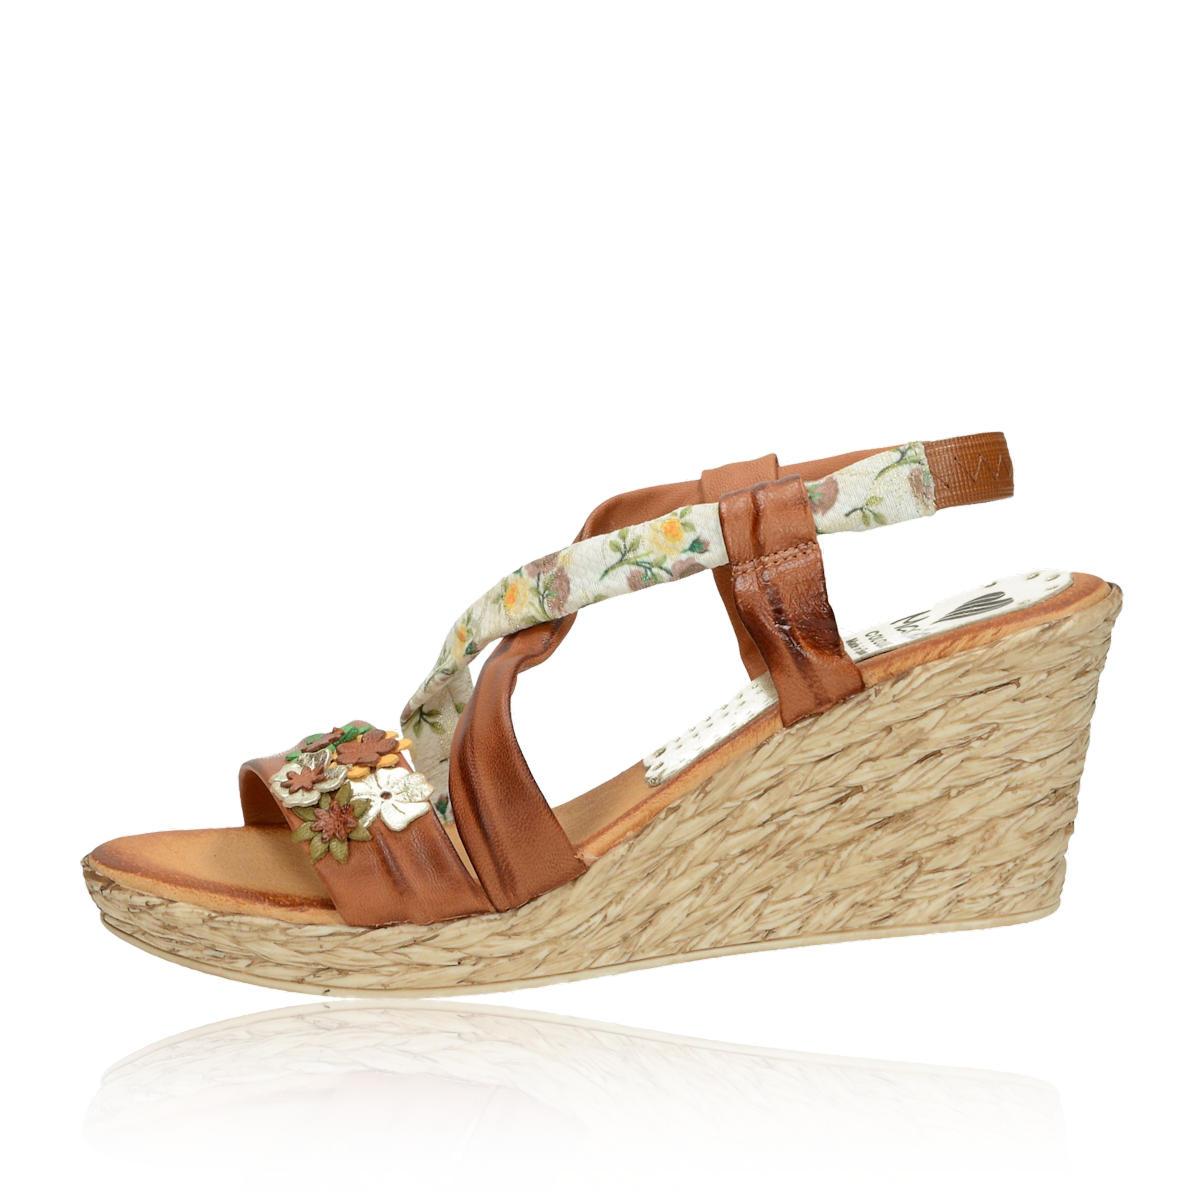 626c809872 ... Marila dámske letné sandále s kvetmi - koňakové ...